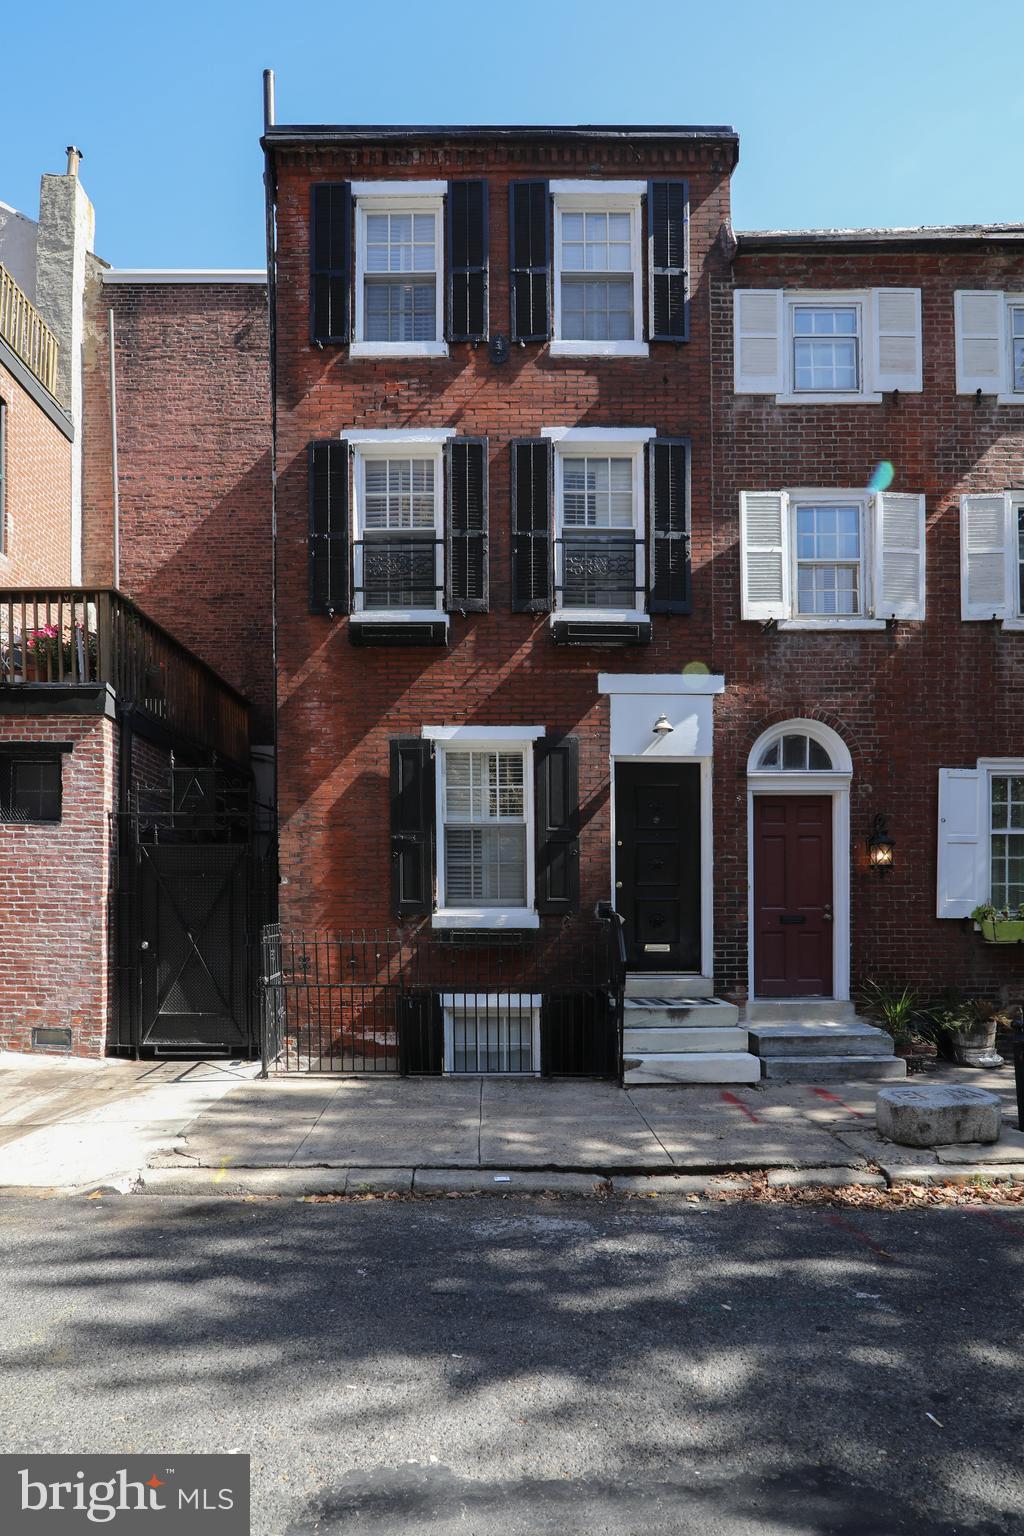 301 S Camac St, Philadelphia, PA, 19107